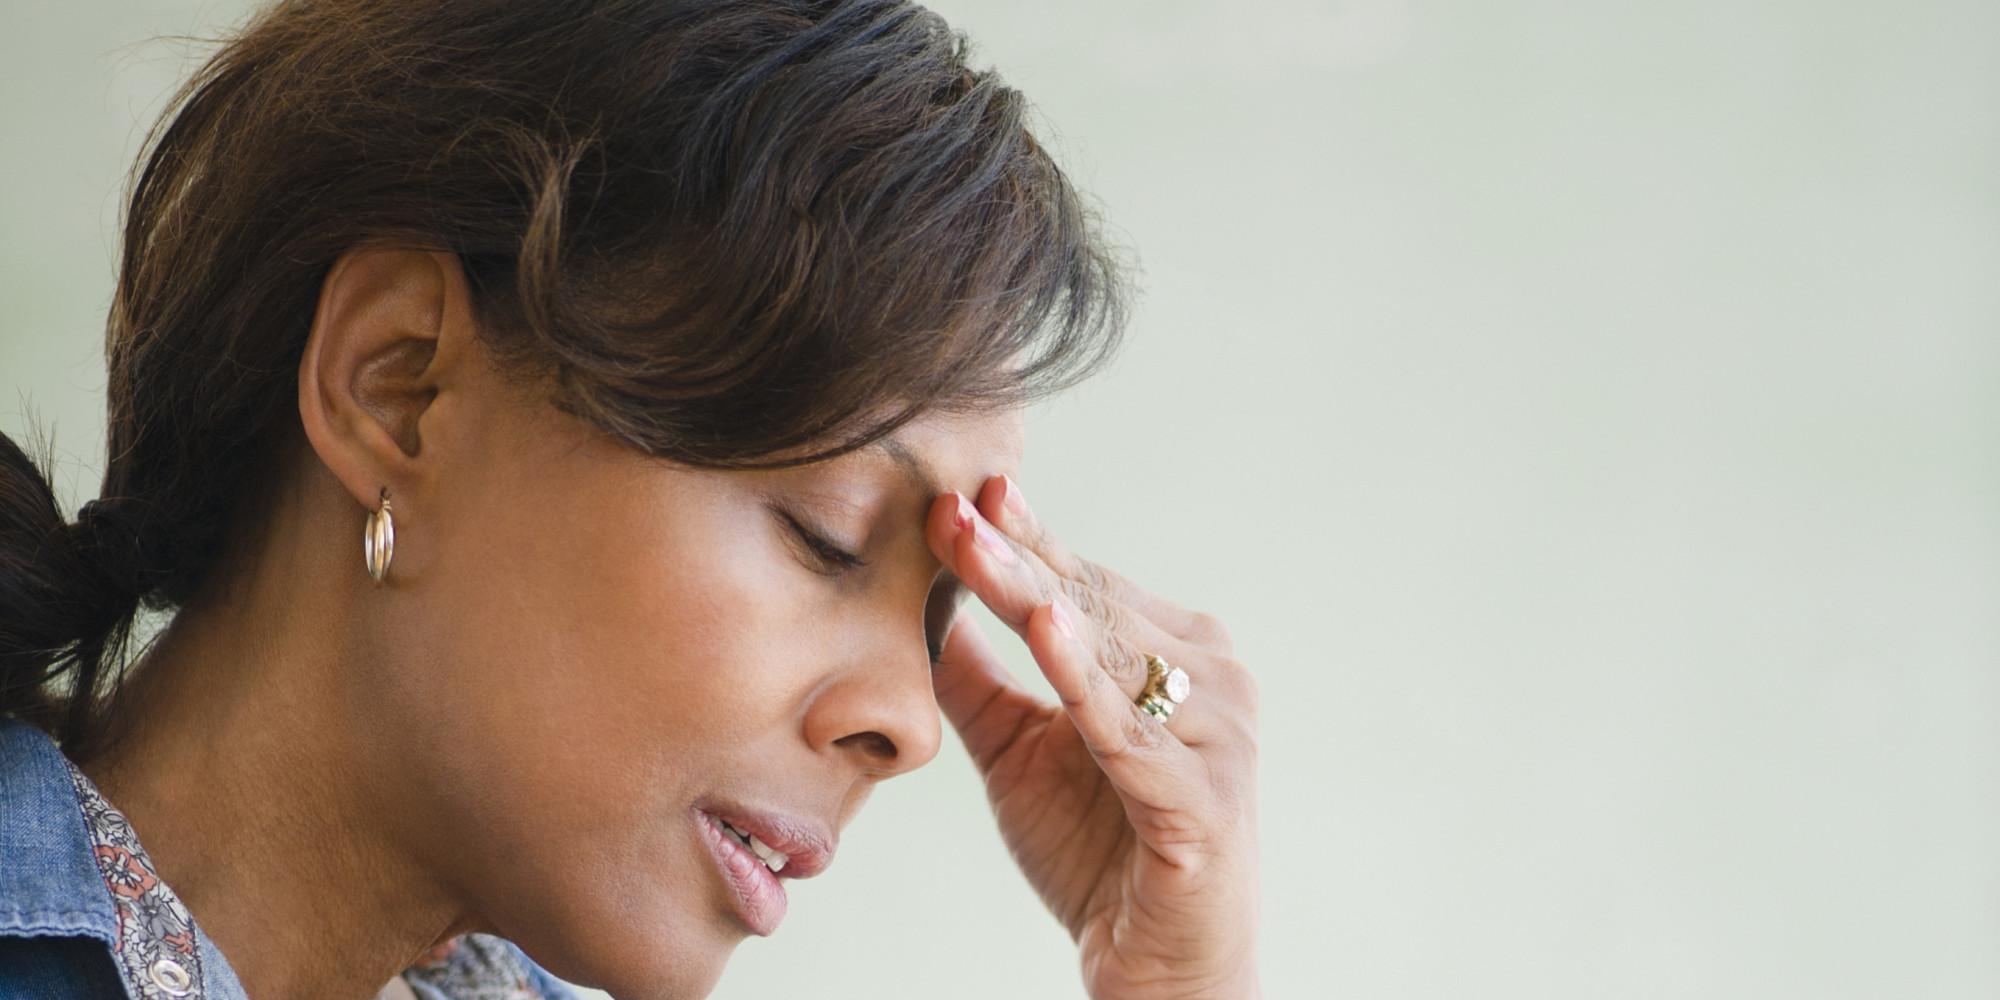 Black teacher in classroom with headache